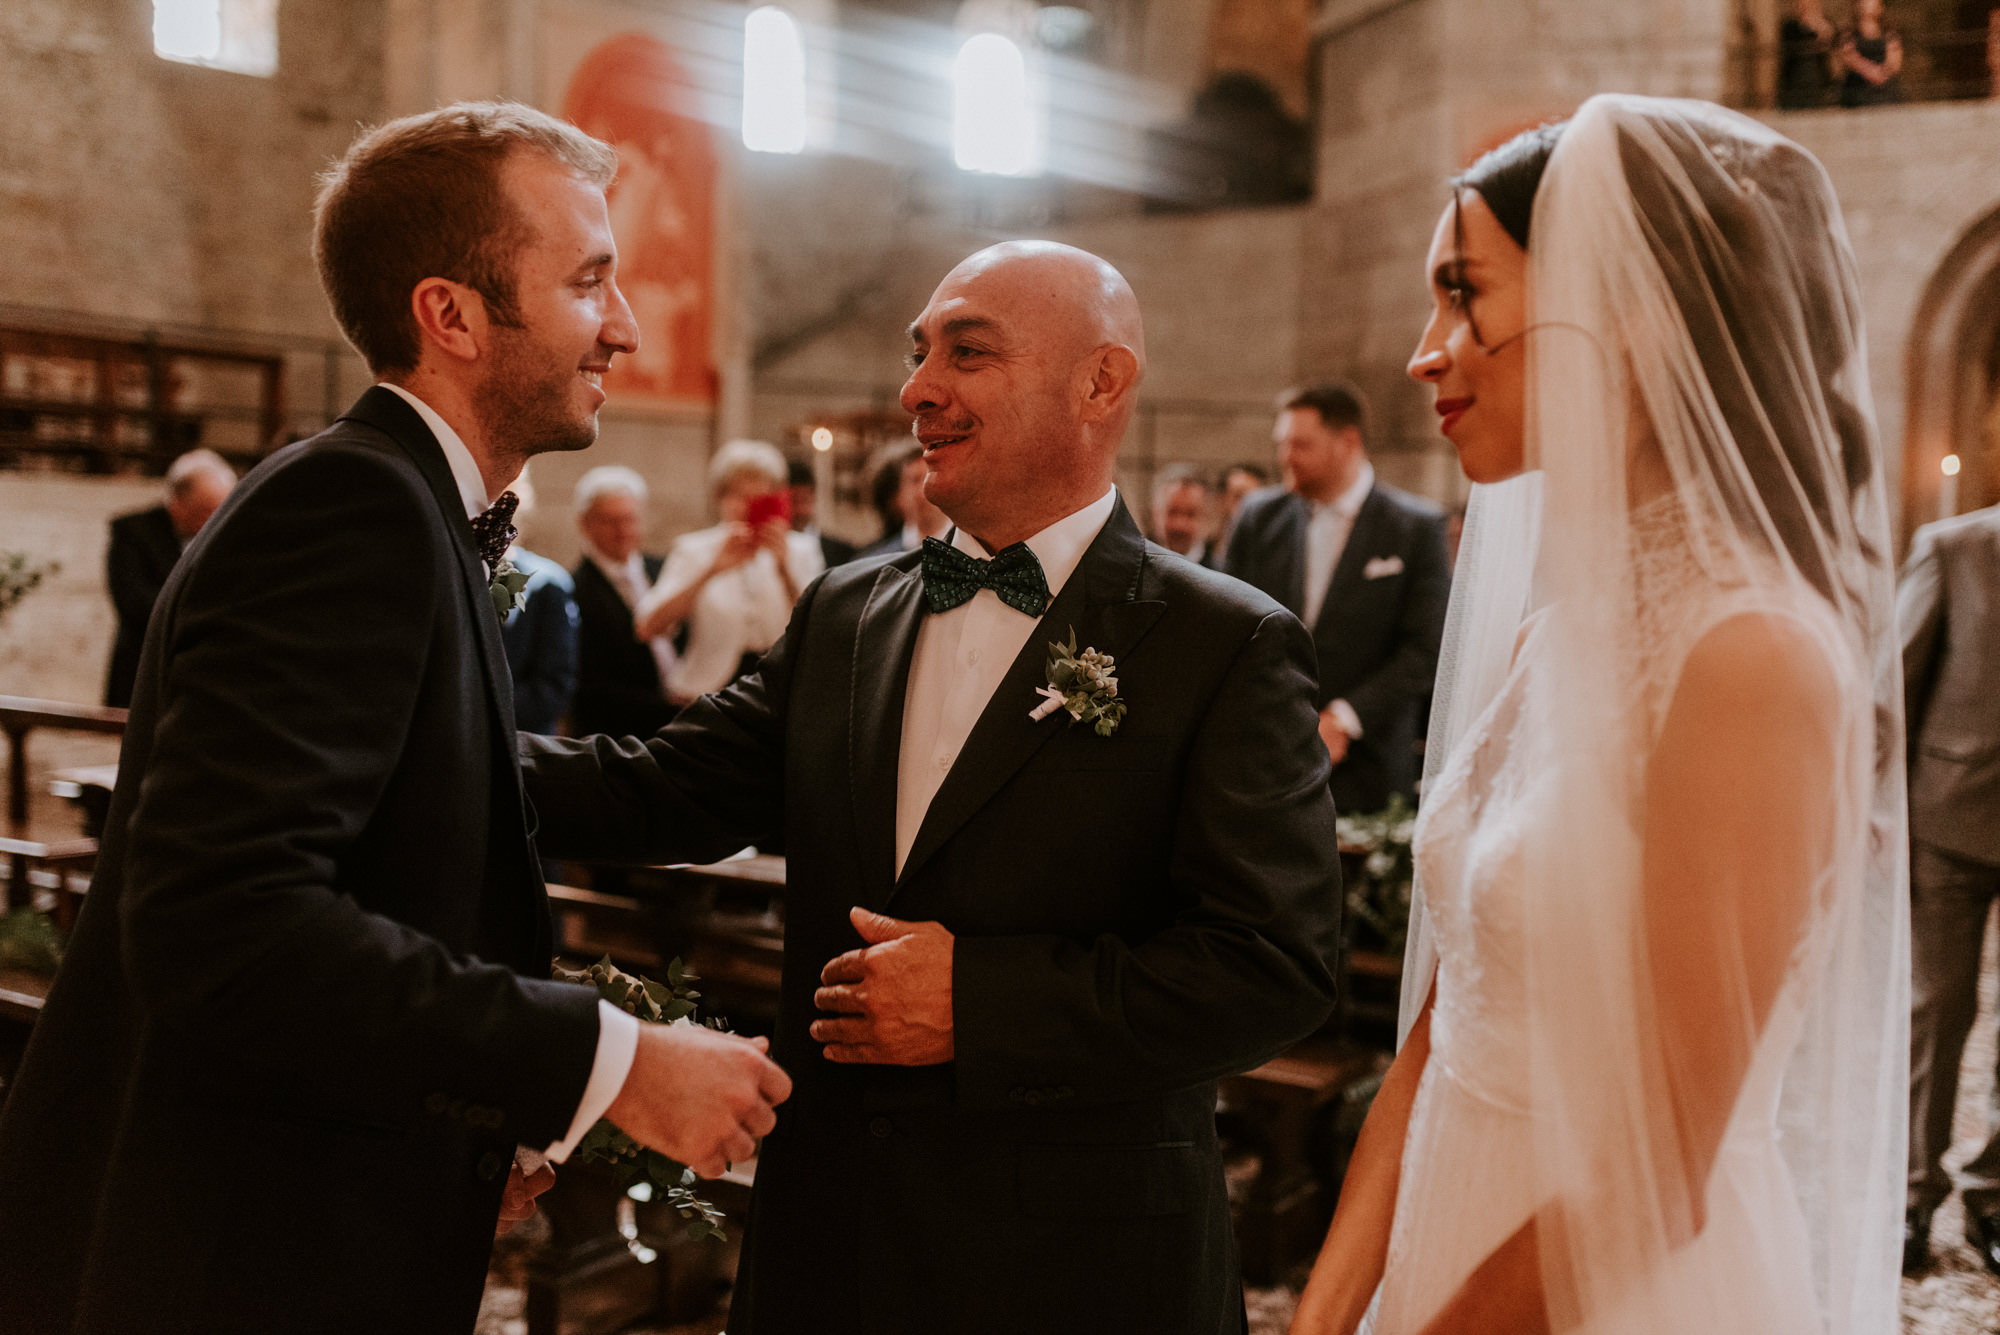 FOTO+PHOTO+BODA+WEDDING+ITALIA+ITALY+MAURICIO+GARAY+MAURICIOGARAY+WEDDINPHOTOGRAPHER+FOTOGRAFODEBODA-763.jpg